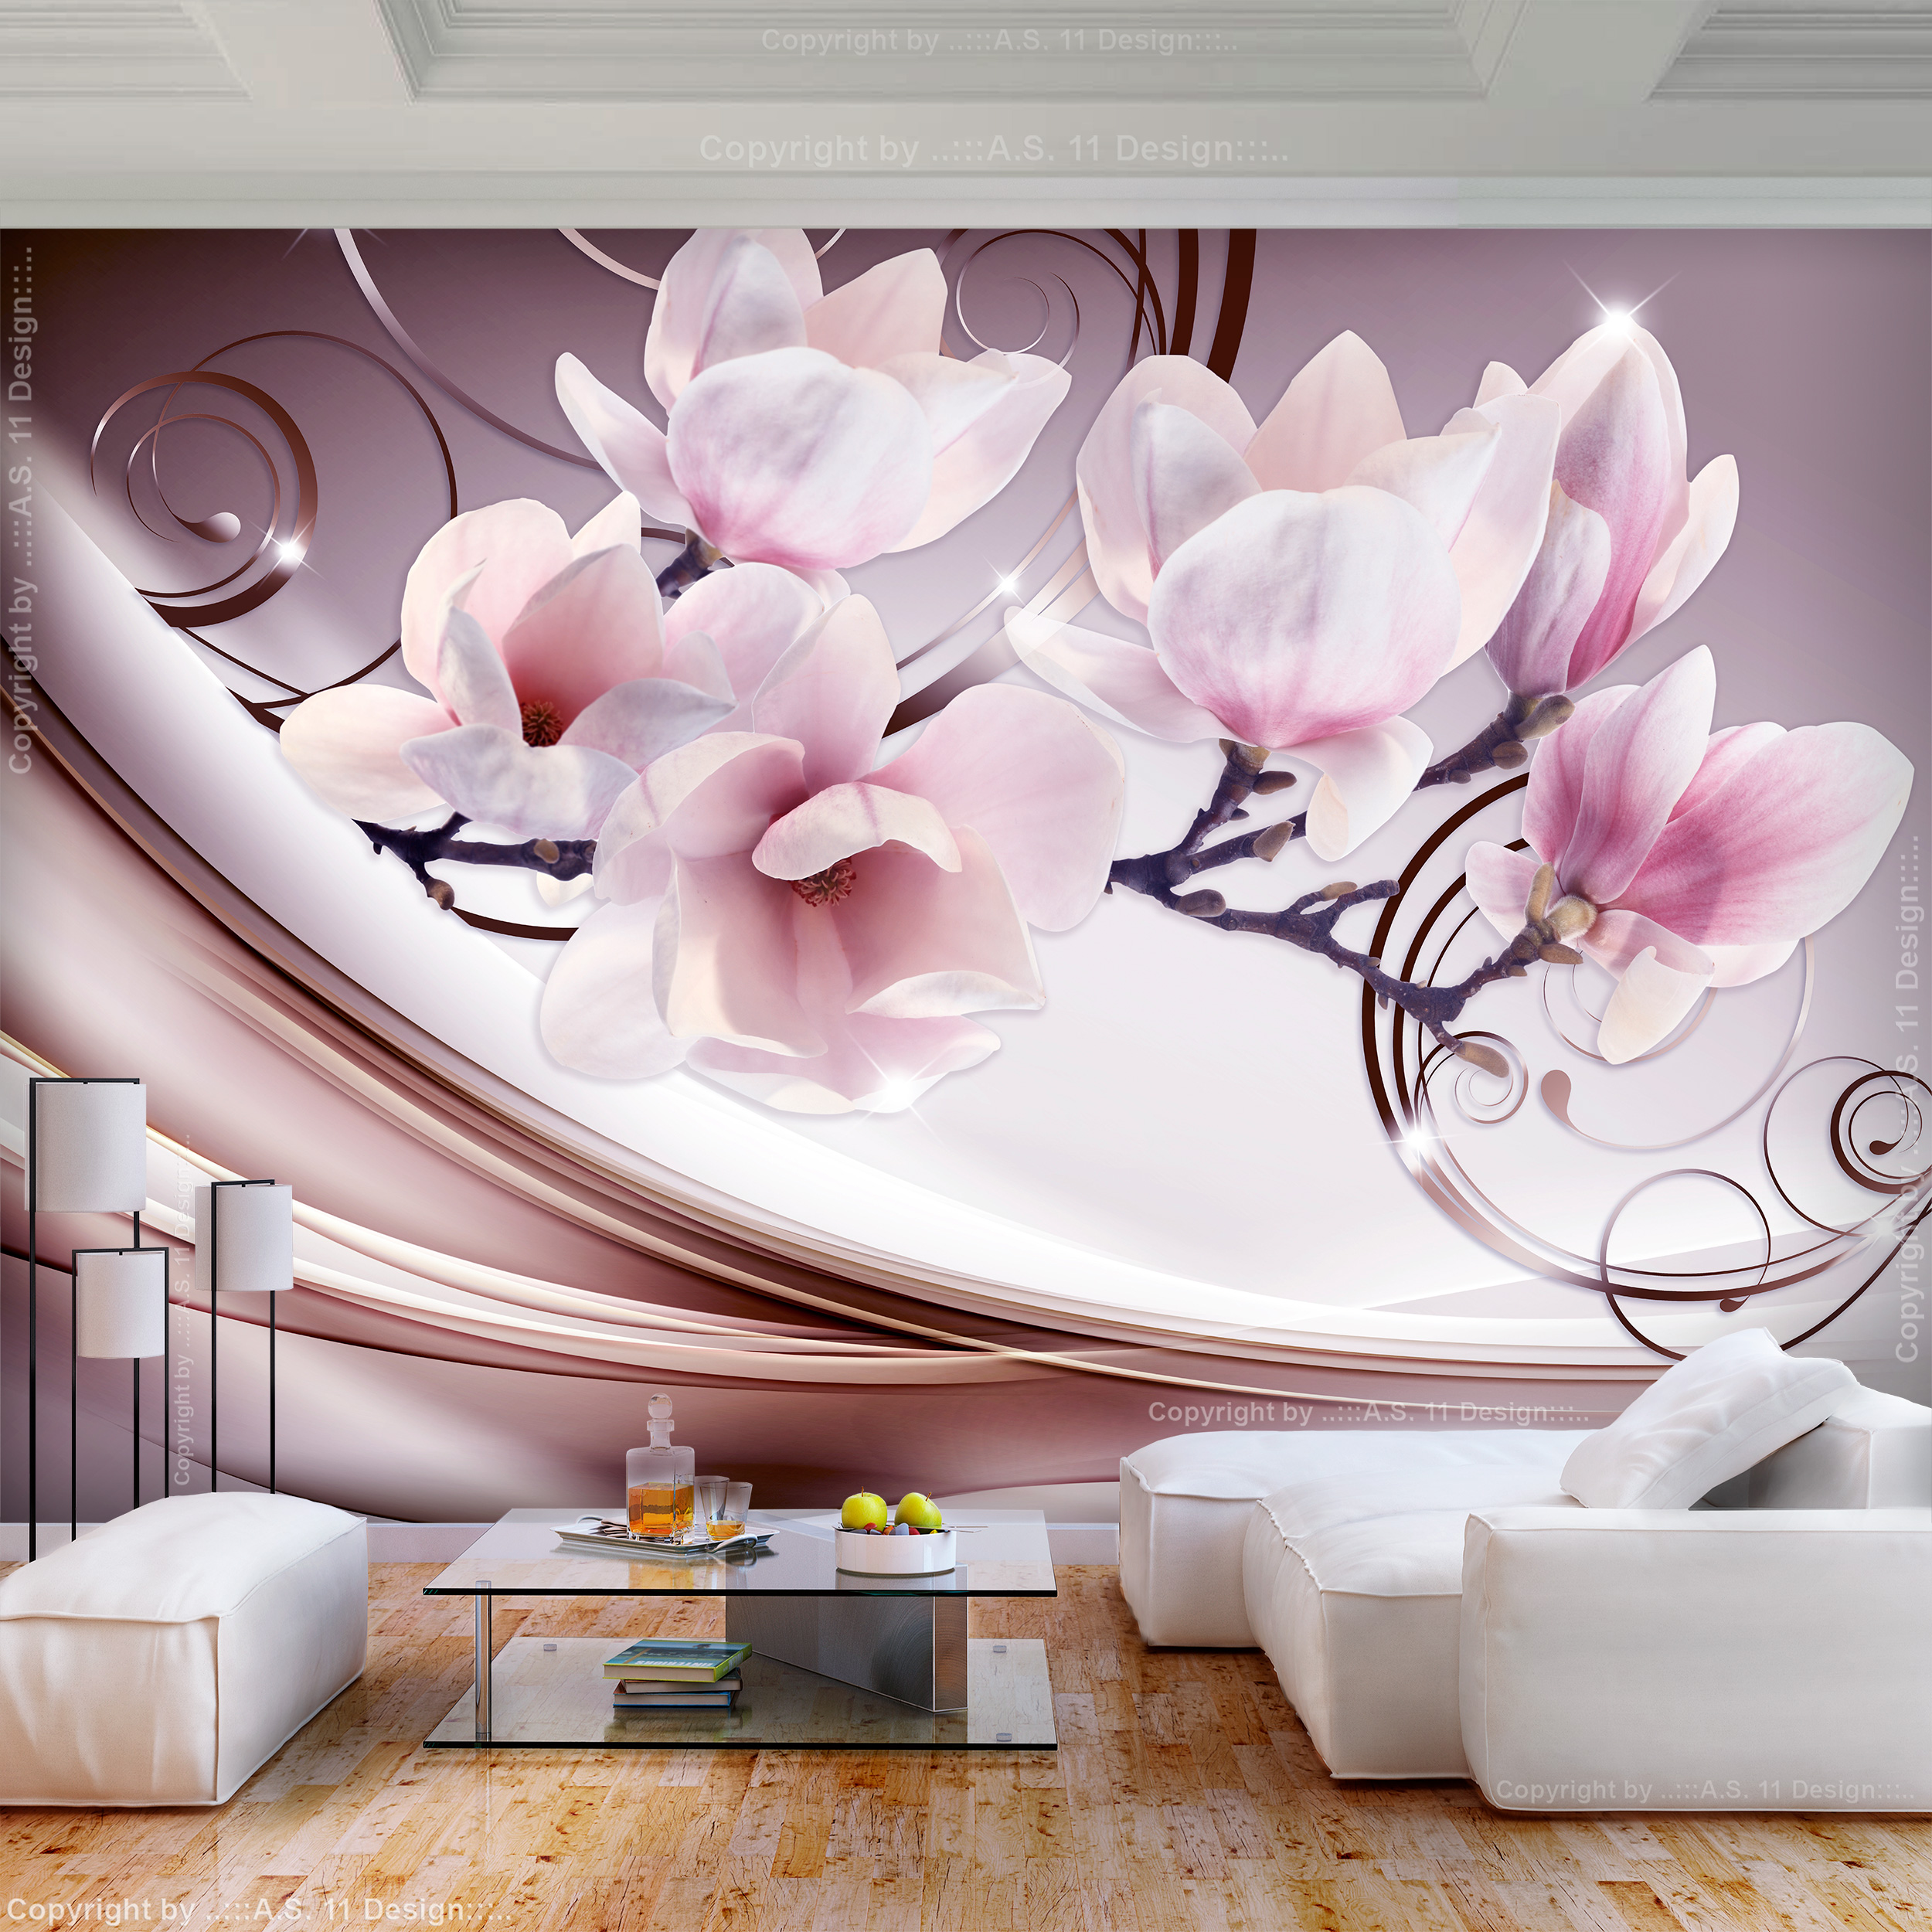 VLIES FOTOTAPETE Magnolien Blumen rosa beige TAPETE WANDBILDER XXL ...